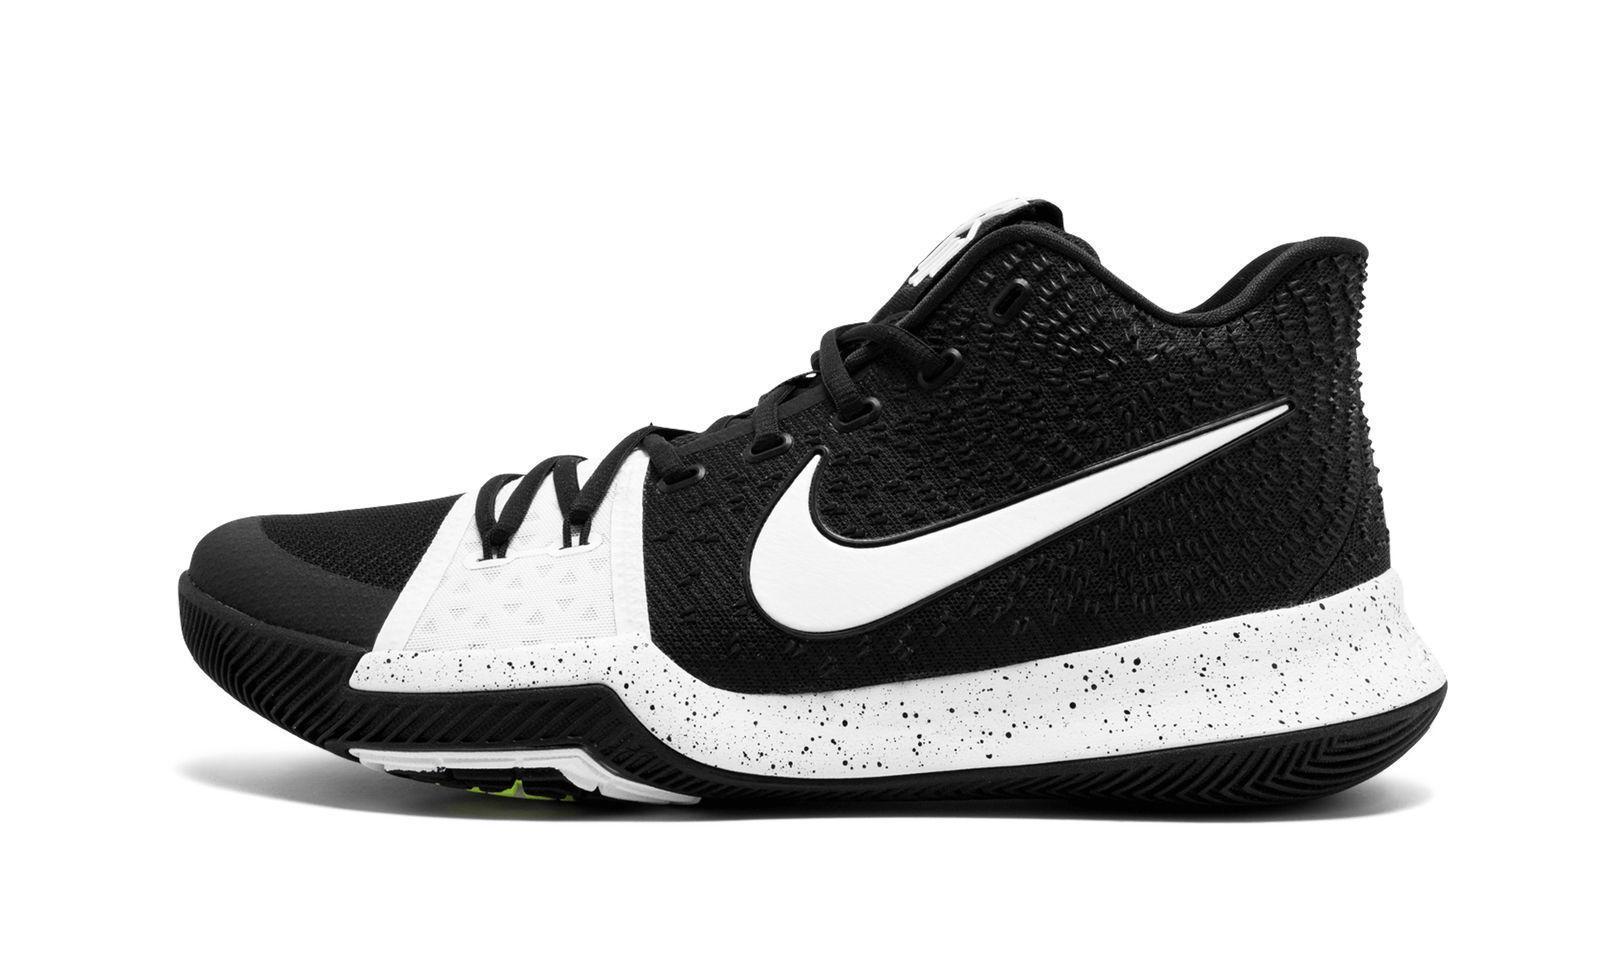 new style 88633 2e9e1 Kyrie 3 Tb Basketball Shoes BLACK WHITE Men and 50 similar items